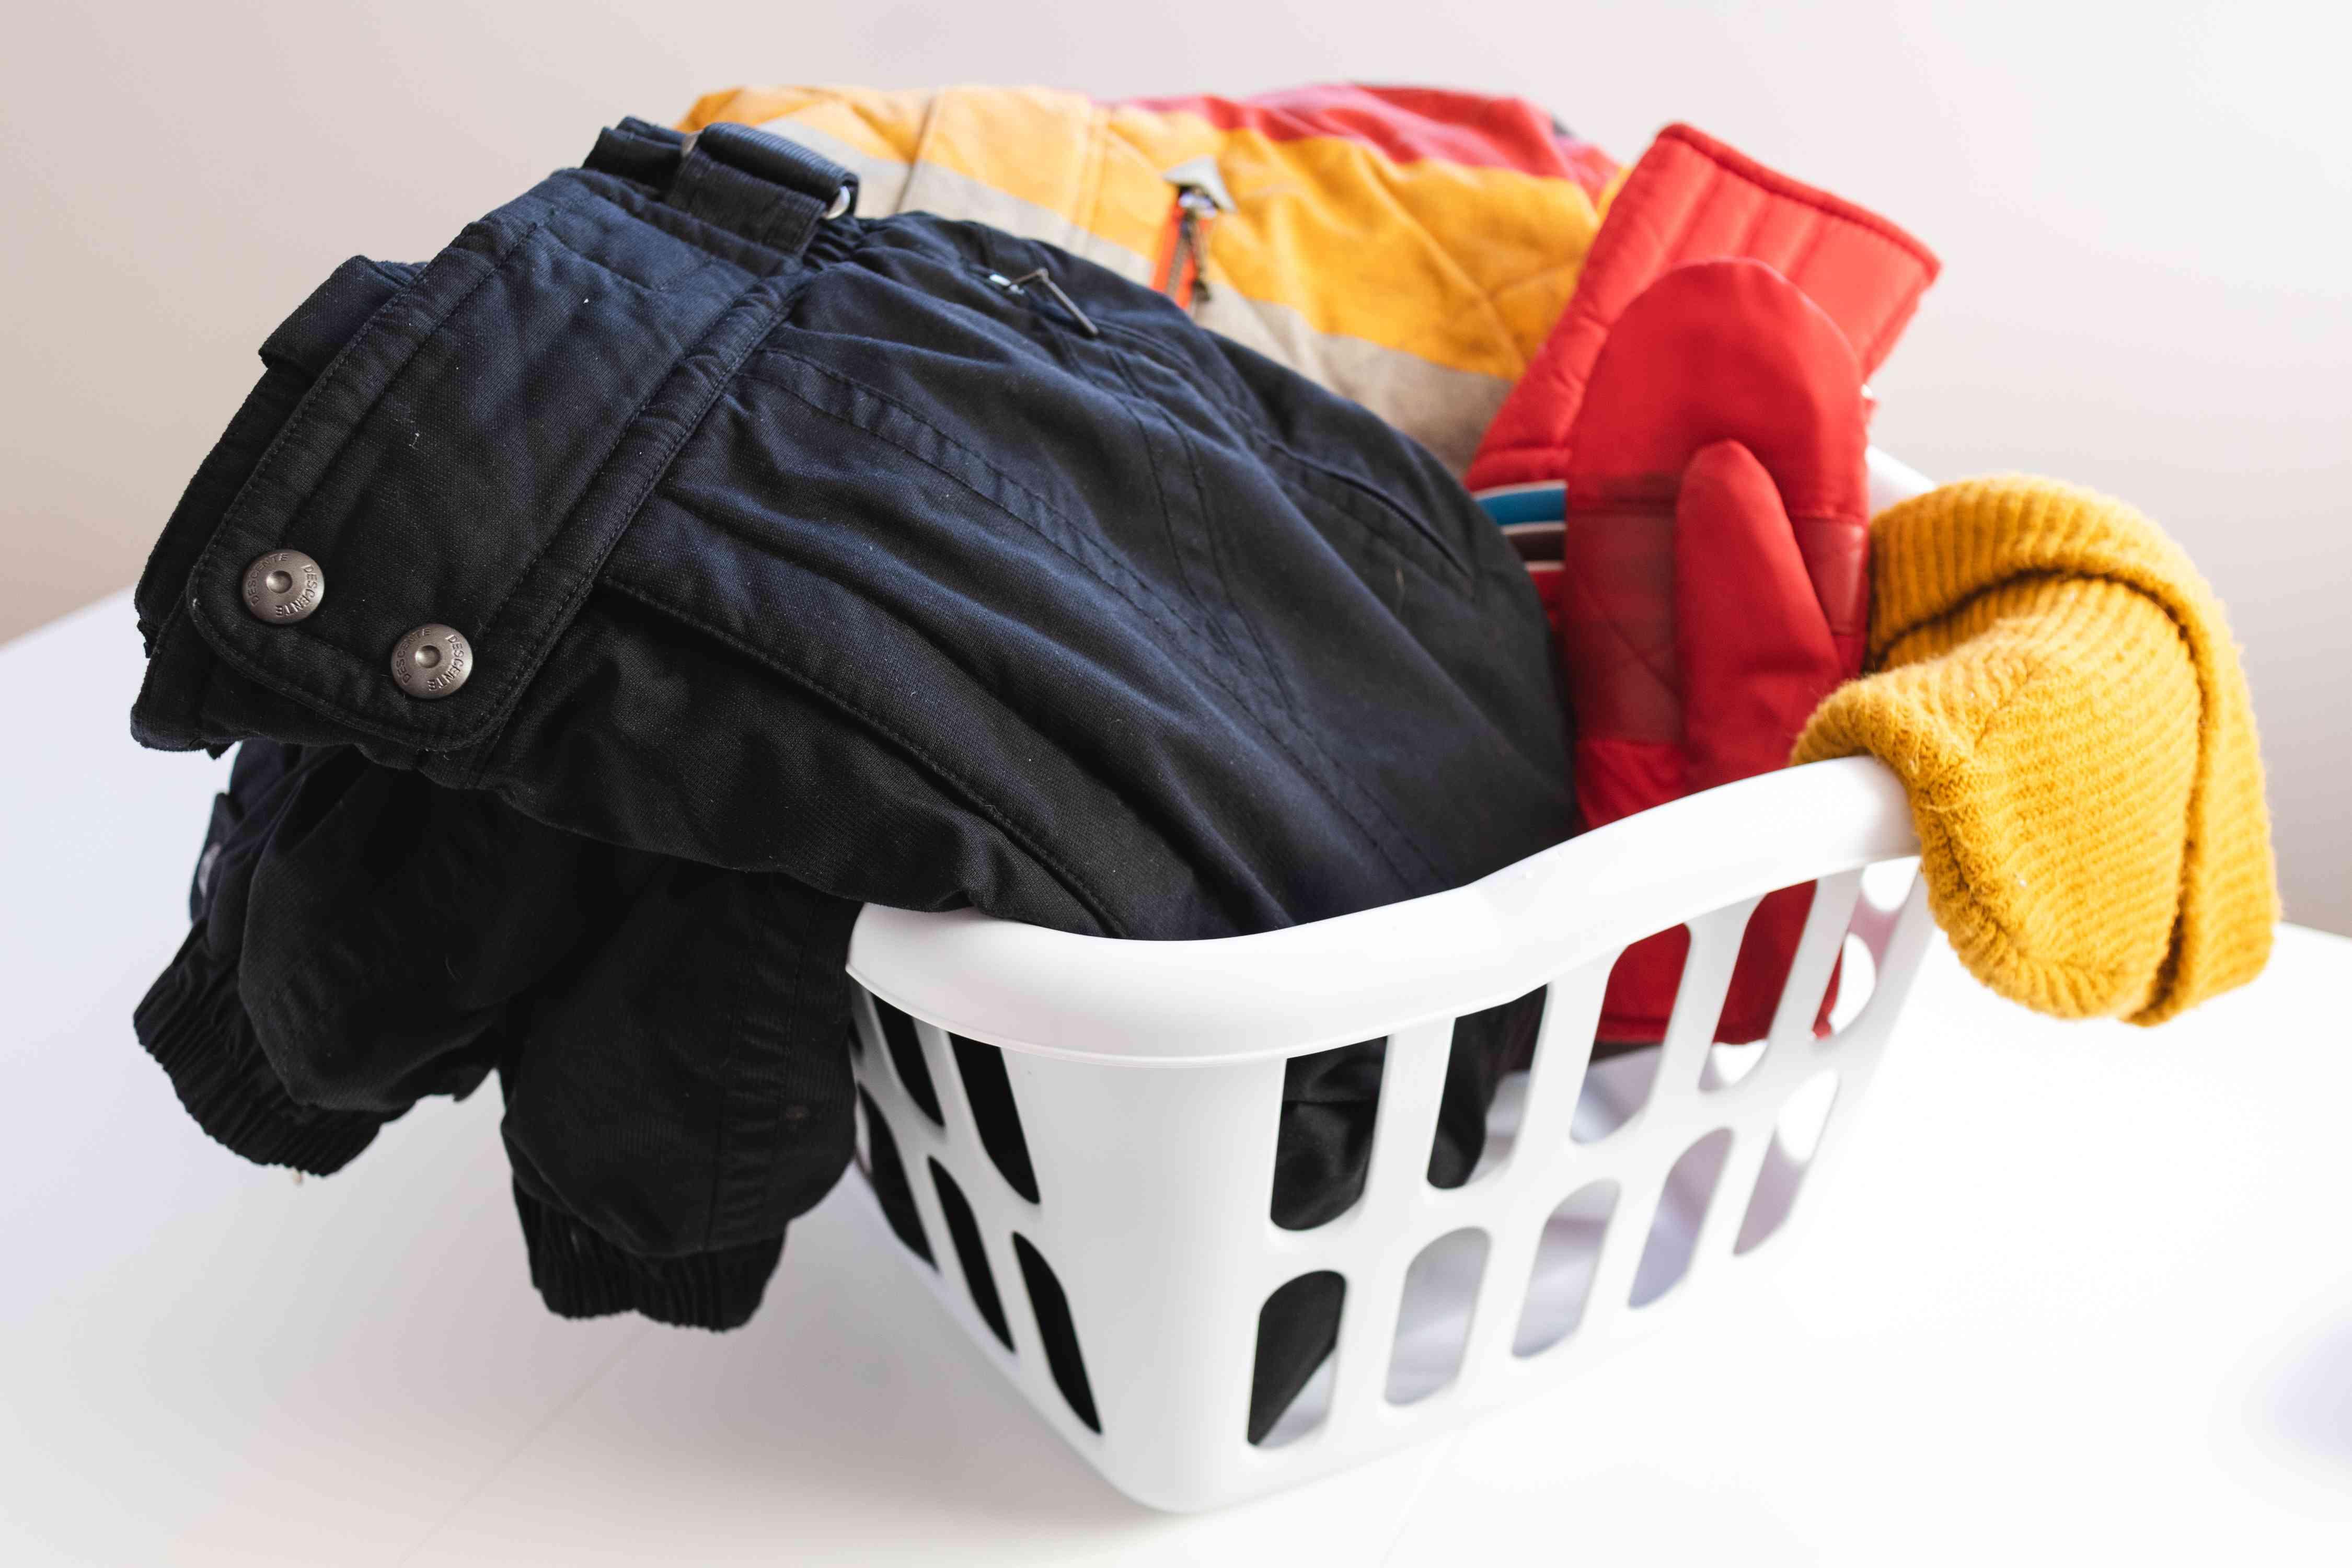 A laundry basket full of ski gear